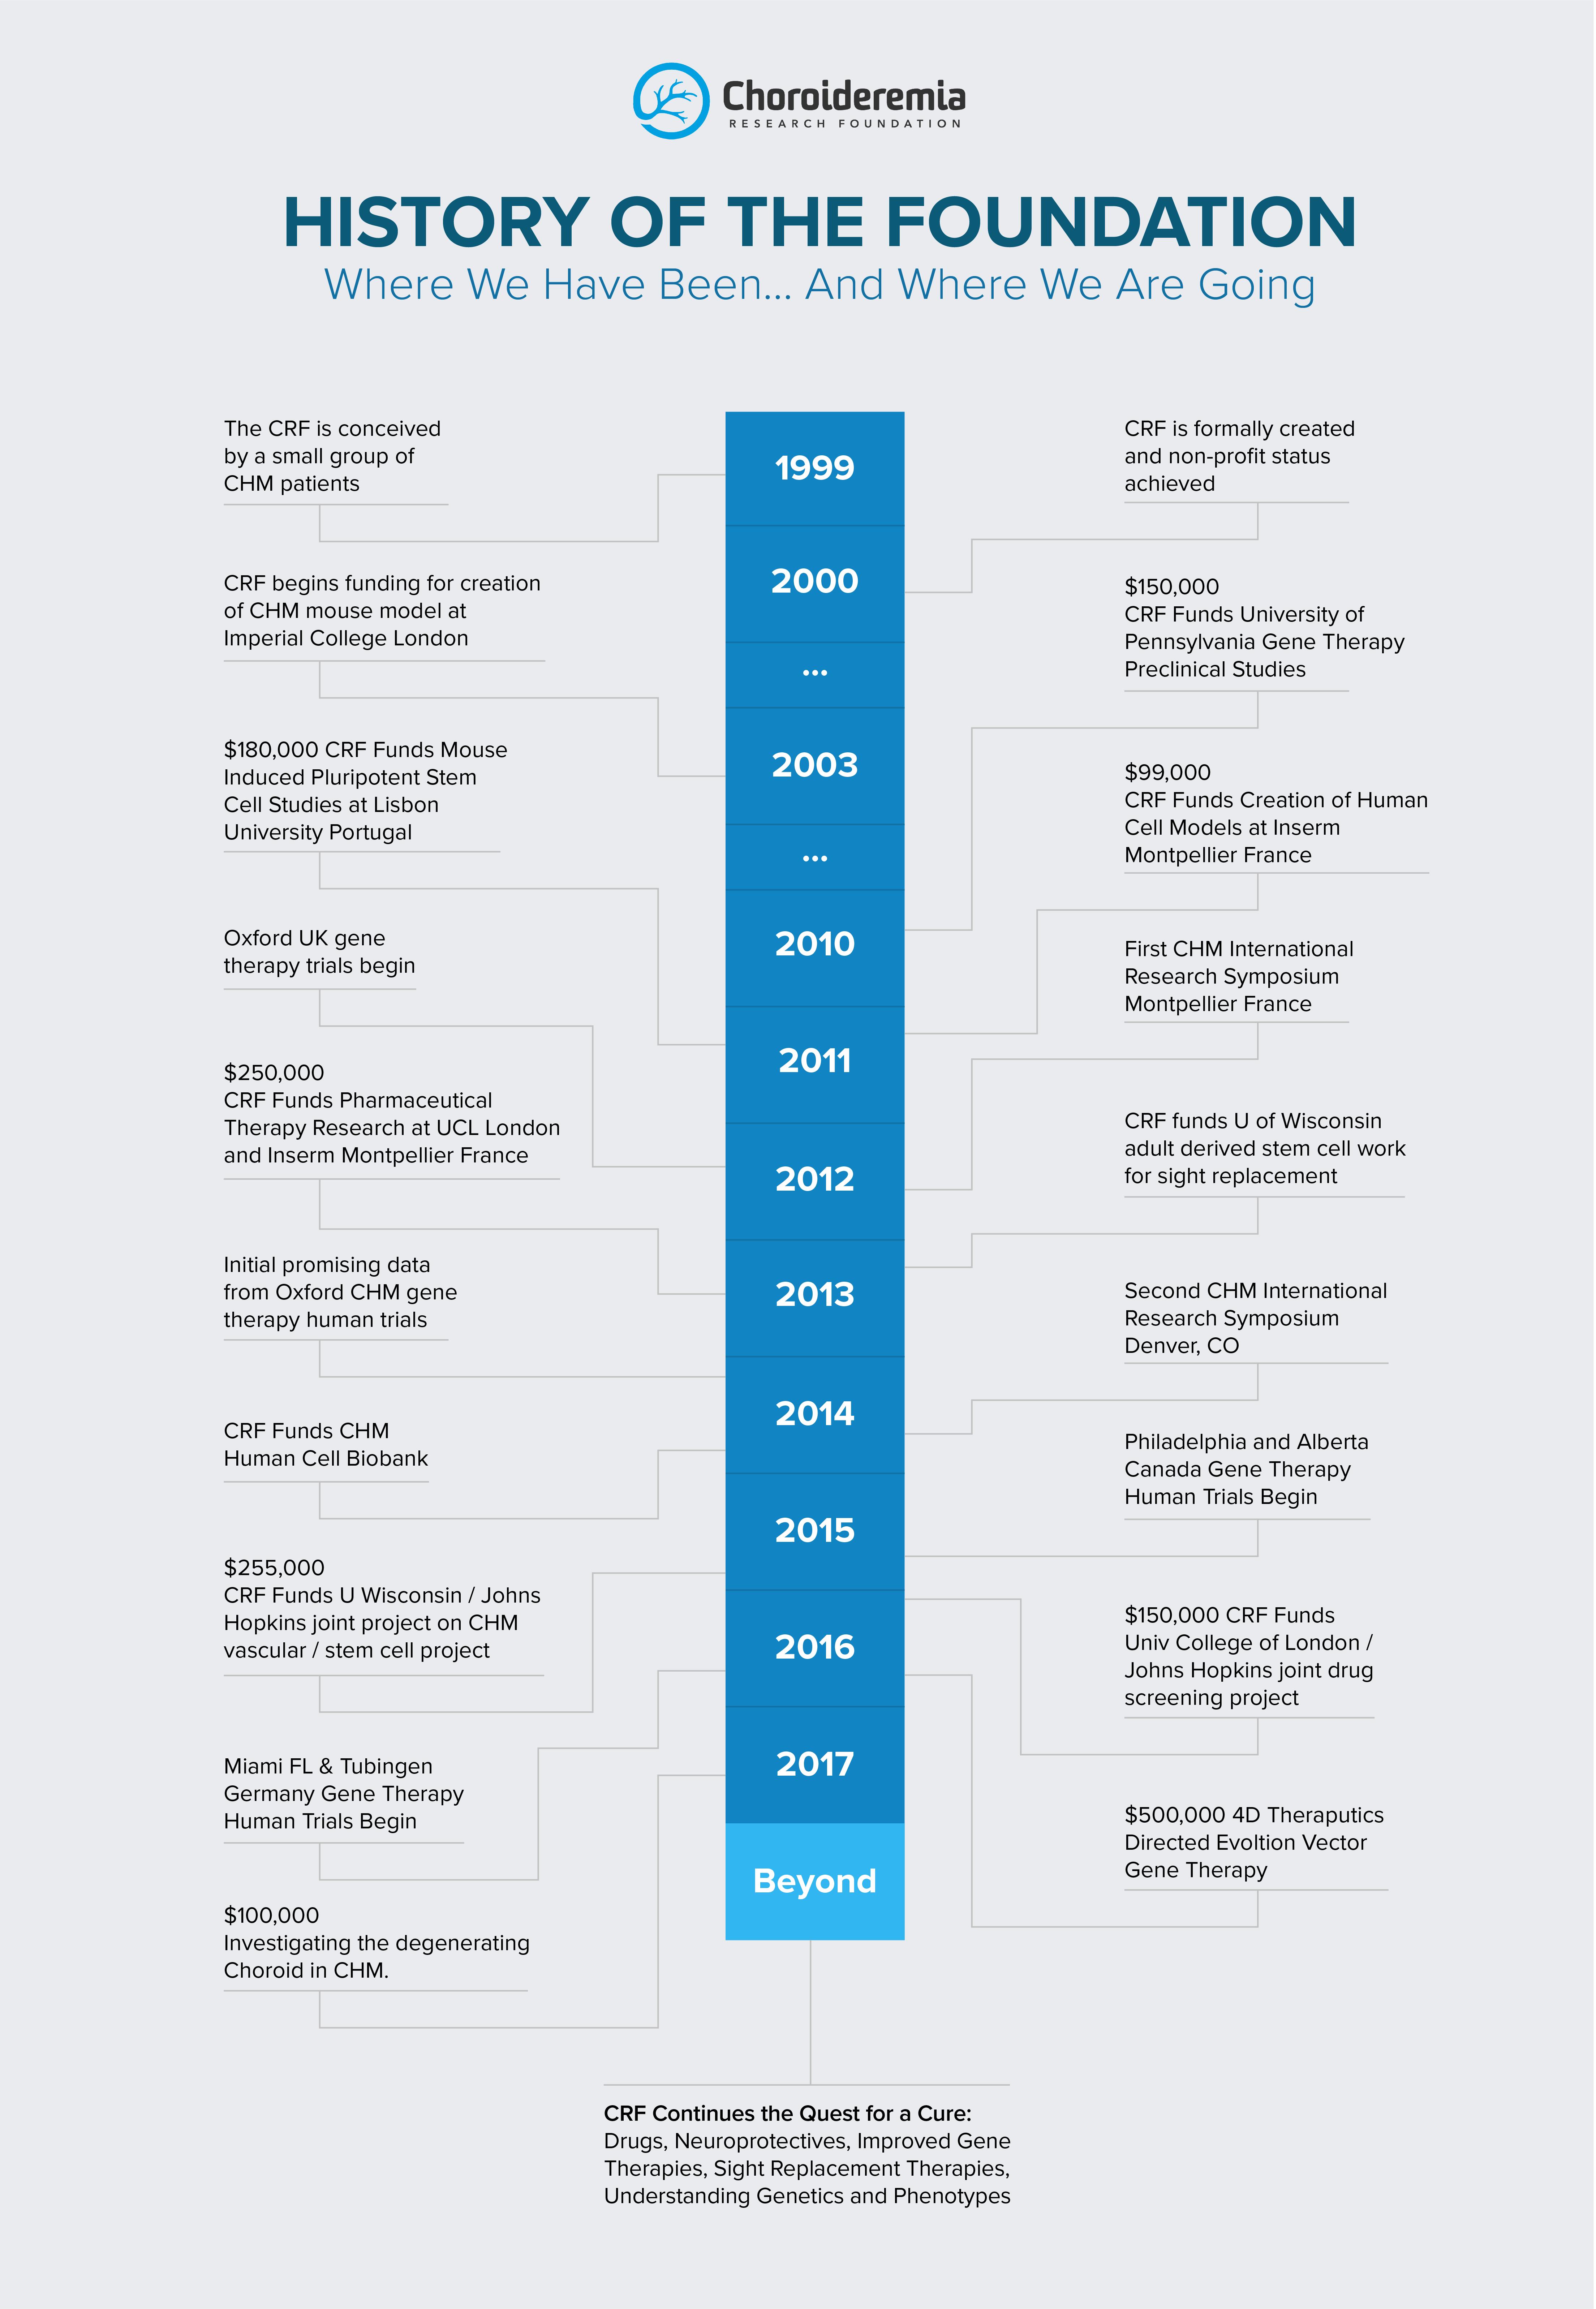 CRF History timeline